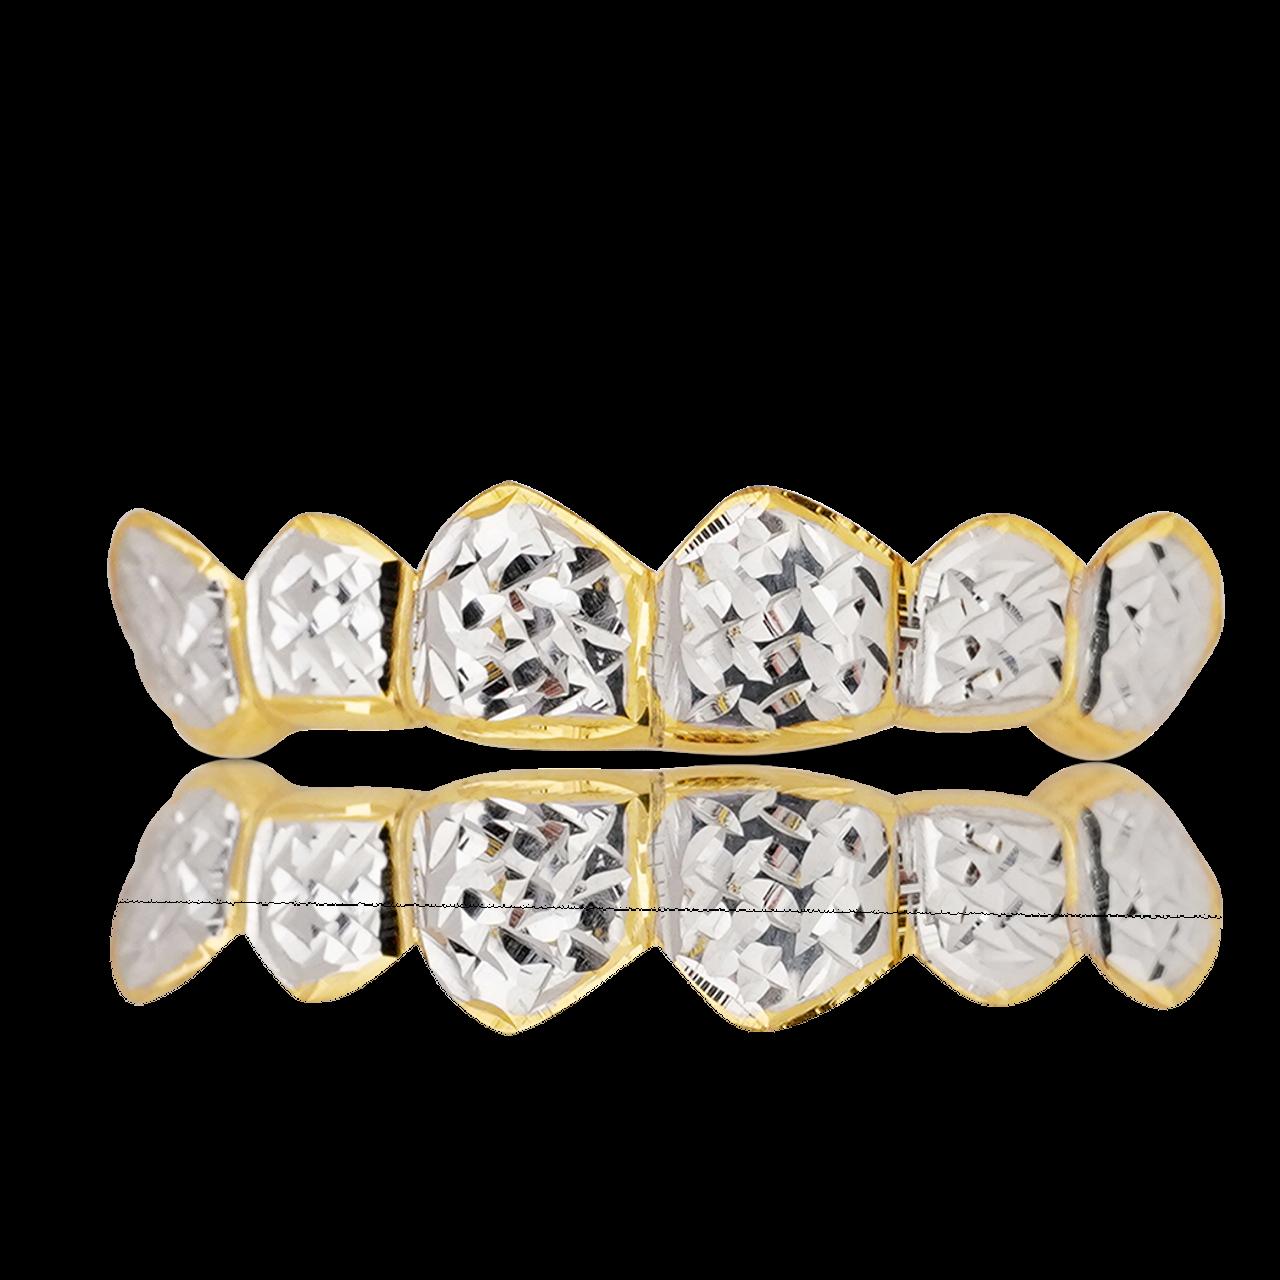 Polished Diamond Cut Yellow Gold Teeth